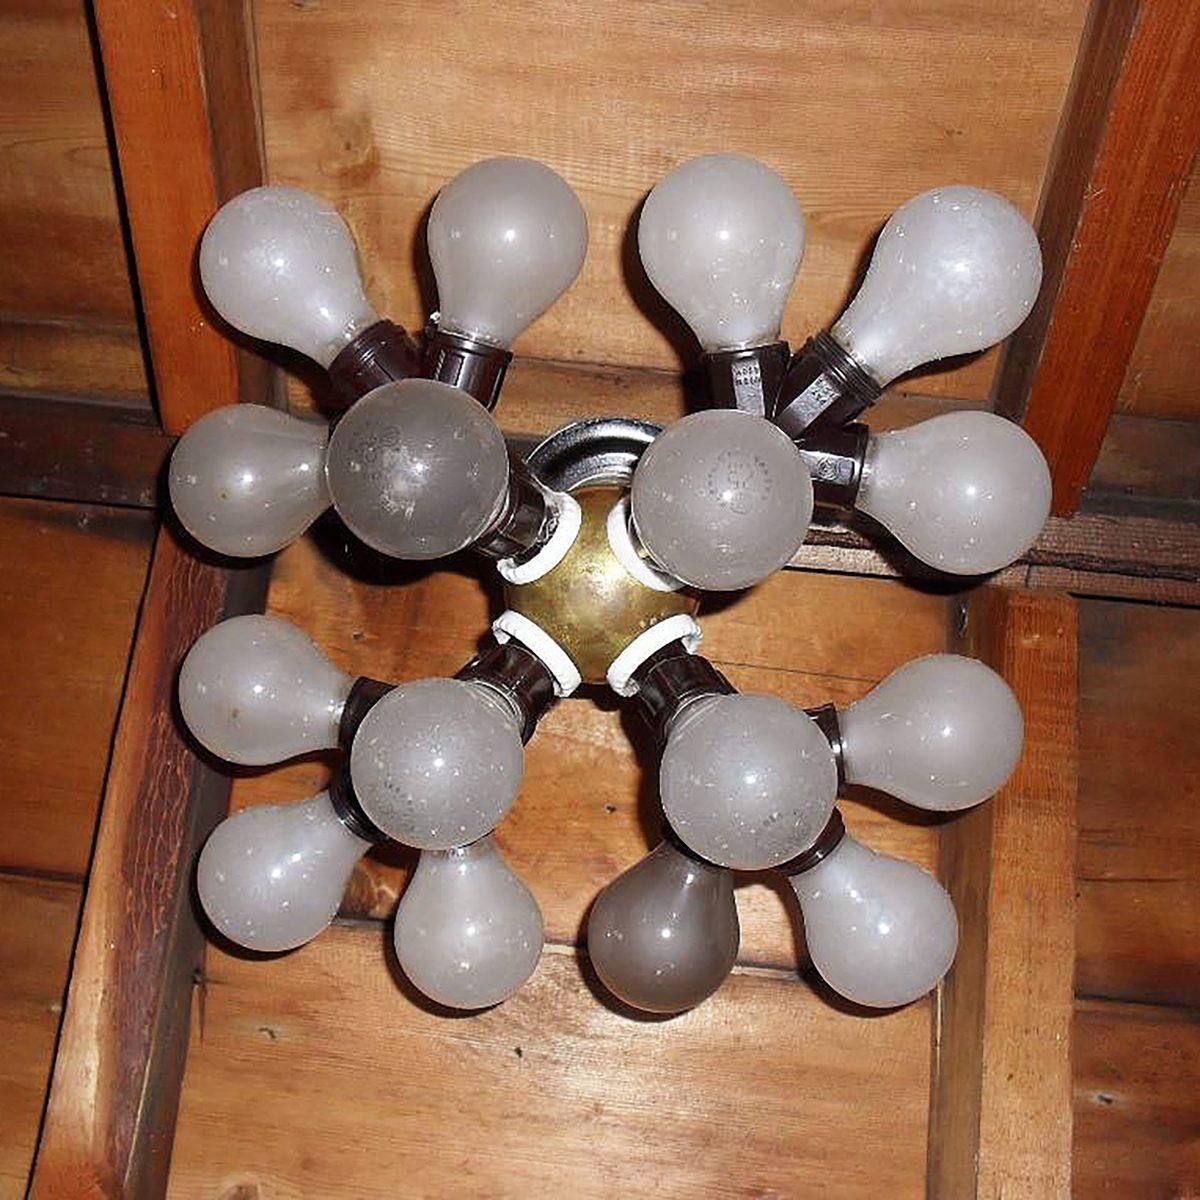 A ball of light bulbs | Construction Pro Tips